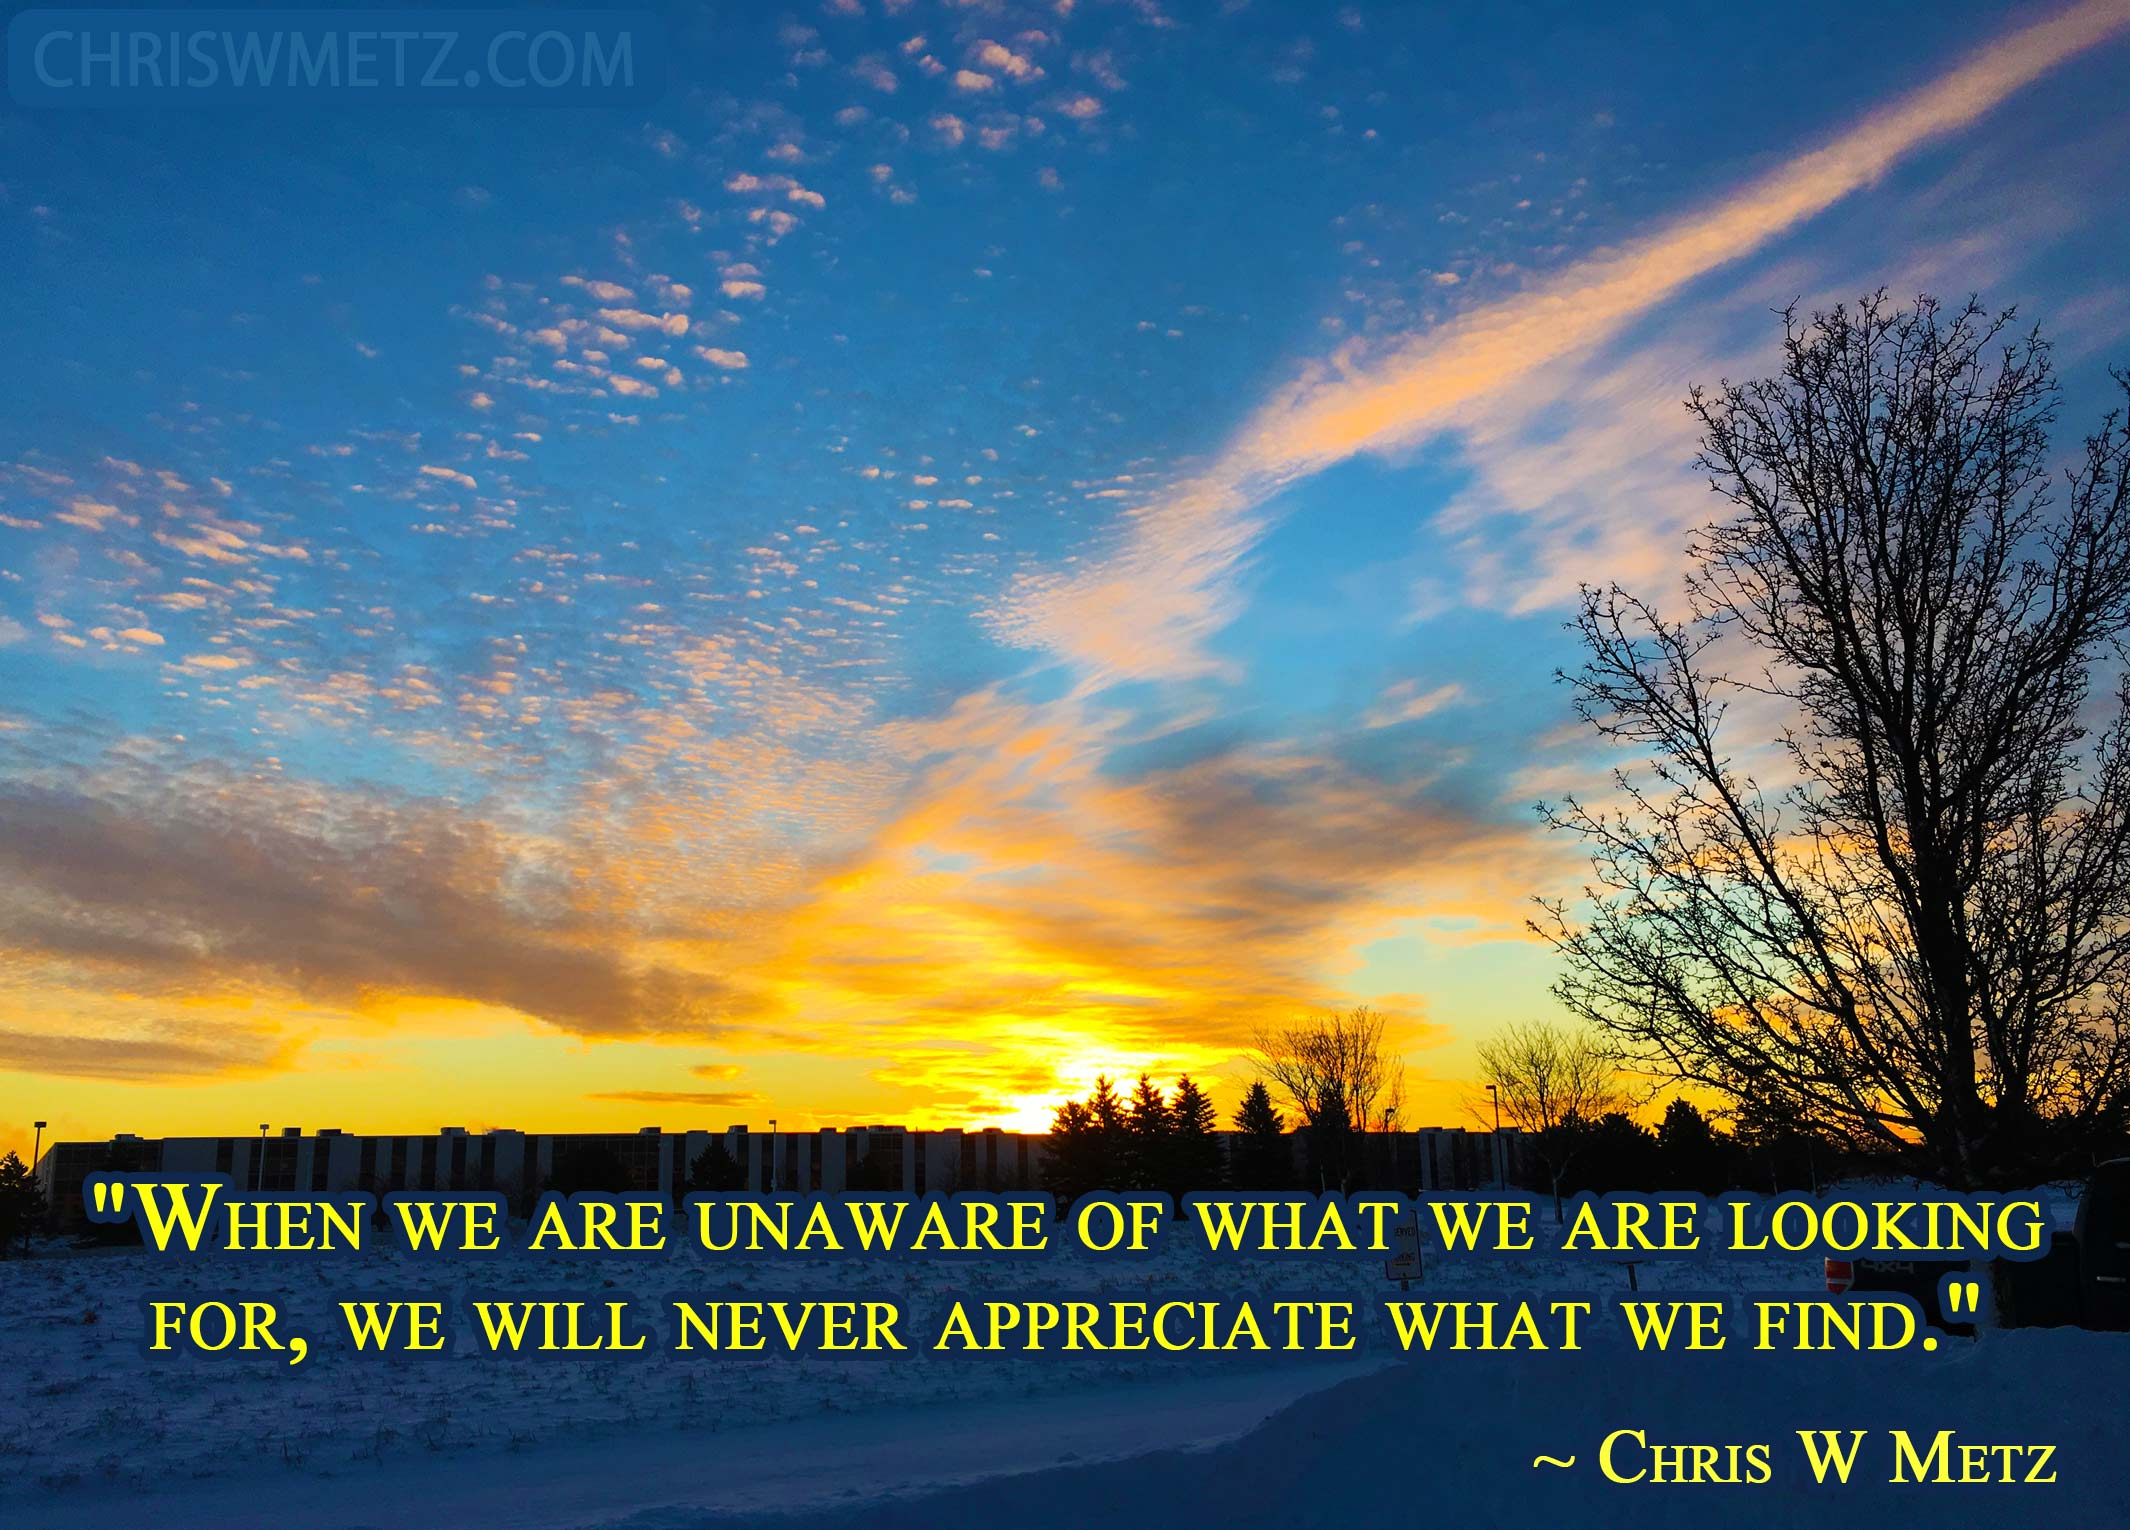 Being Present Mindfulness Quote 5 CWM Chris W Metz